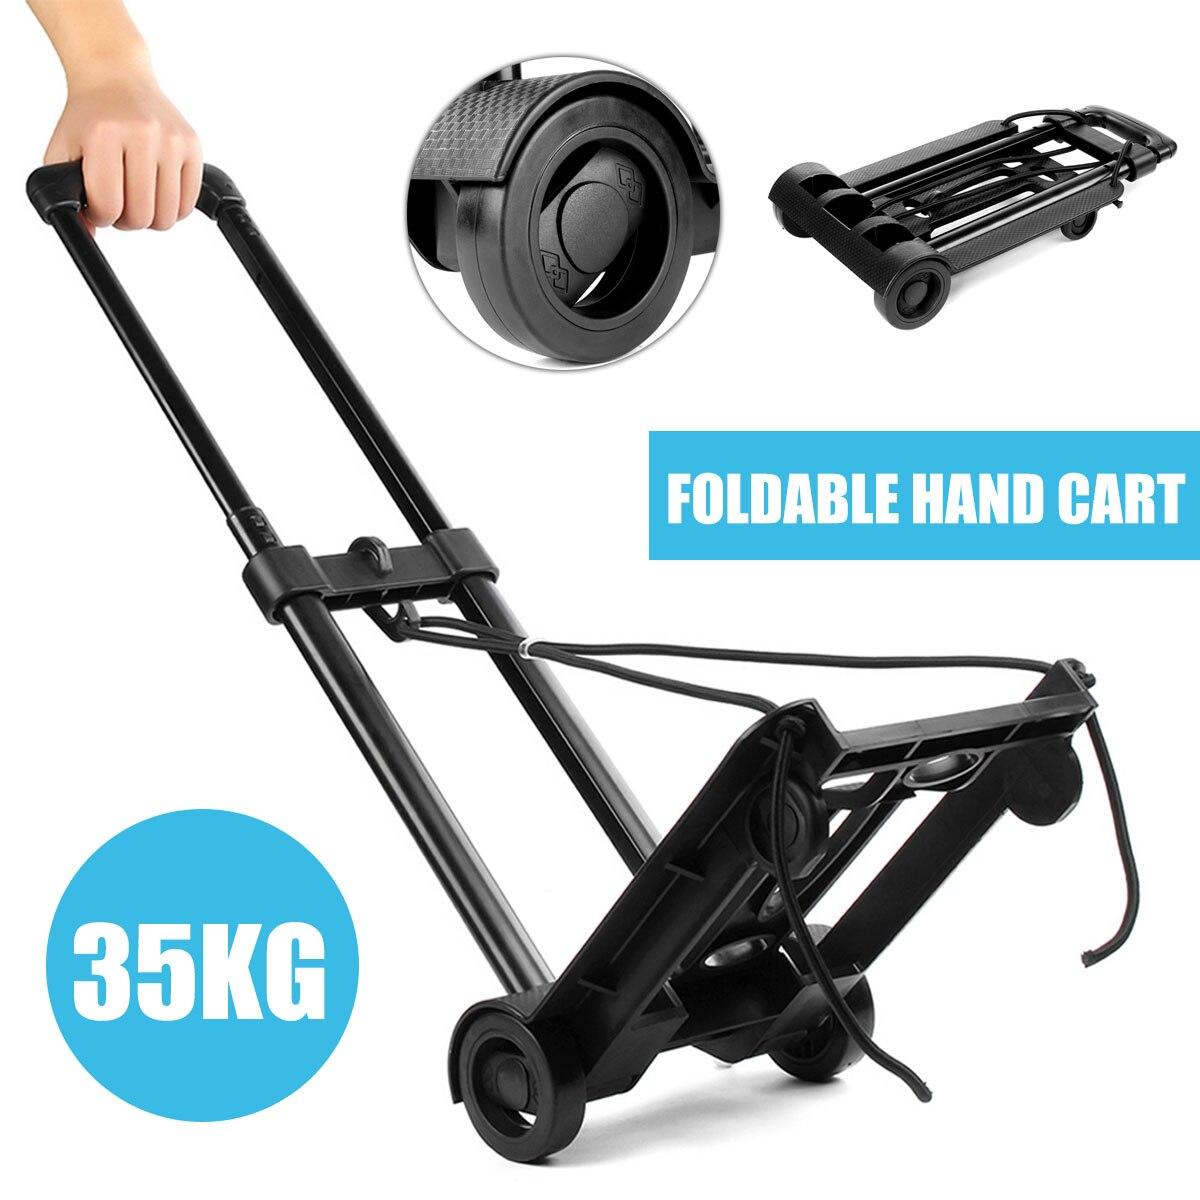 35KG Foldable Hand Luguagge Trolley Cart Adjustable Metal Alloy Handcart Heavy L